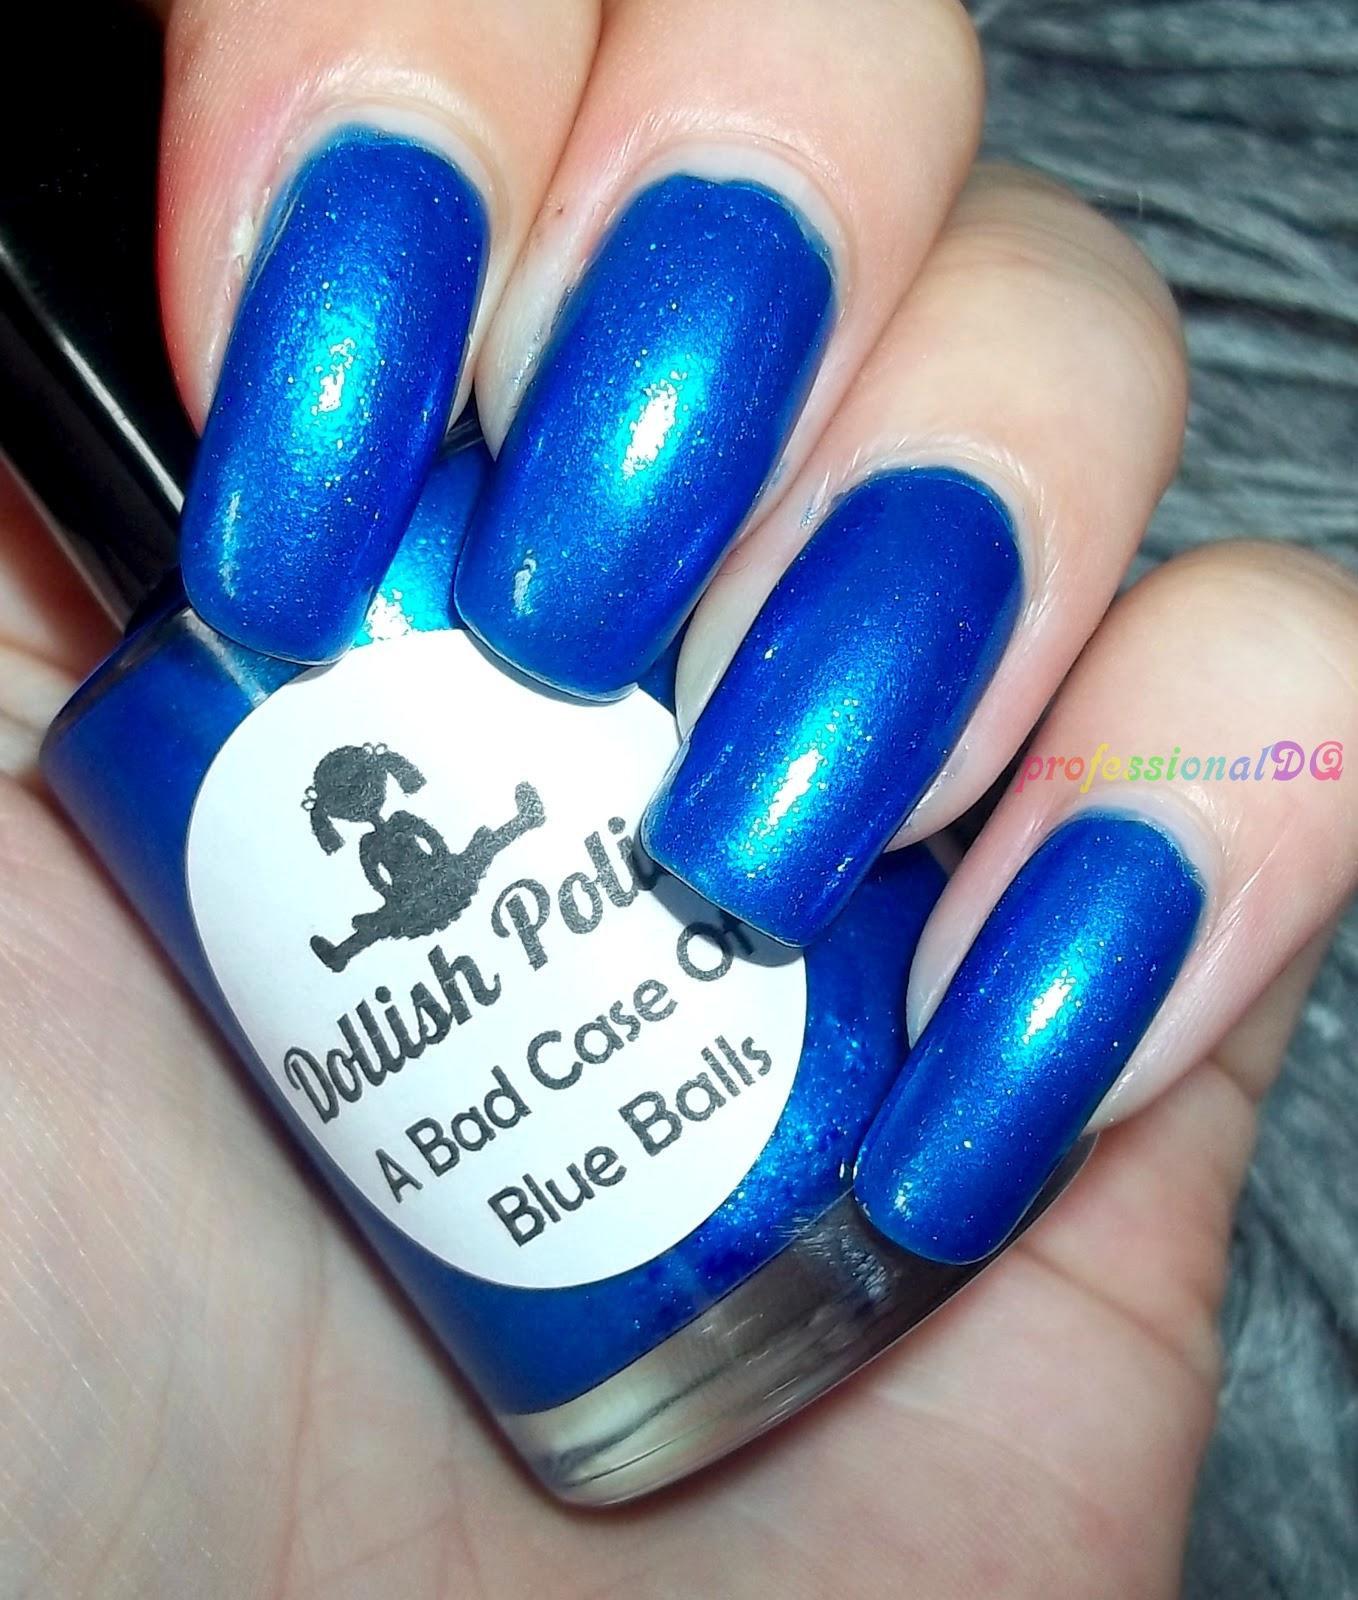 Blue Balls With Flash Yay Shiny